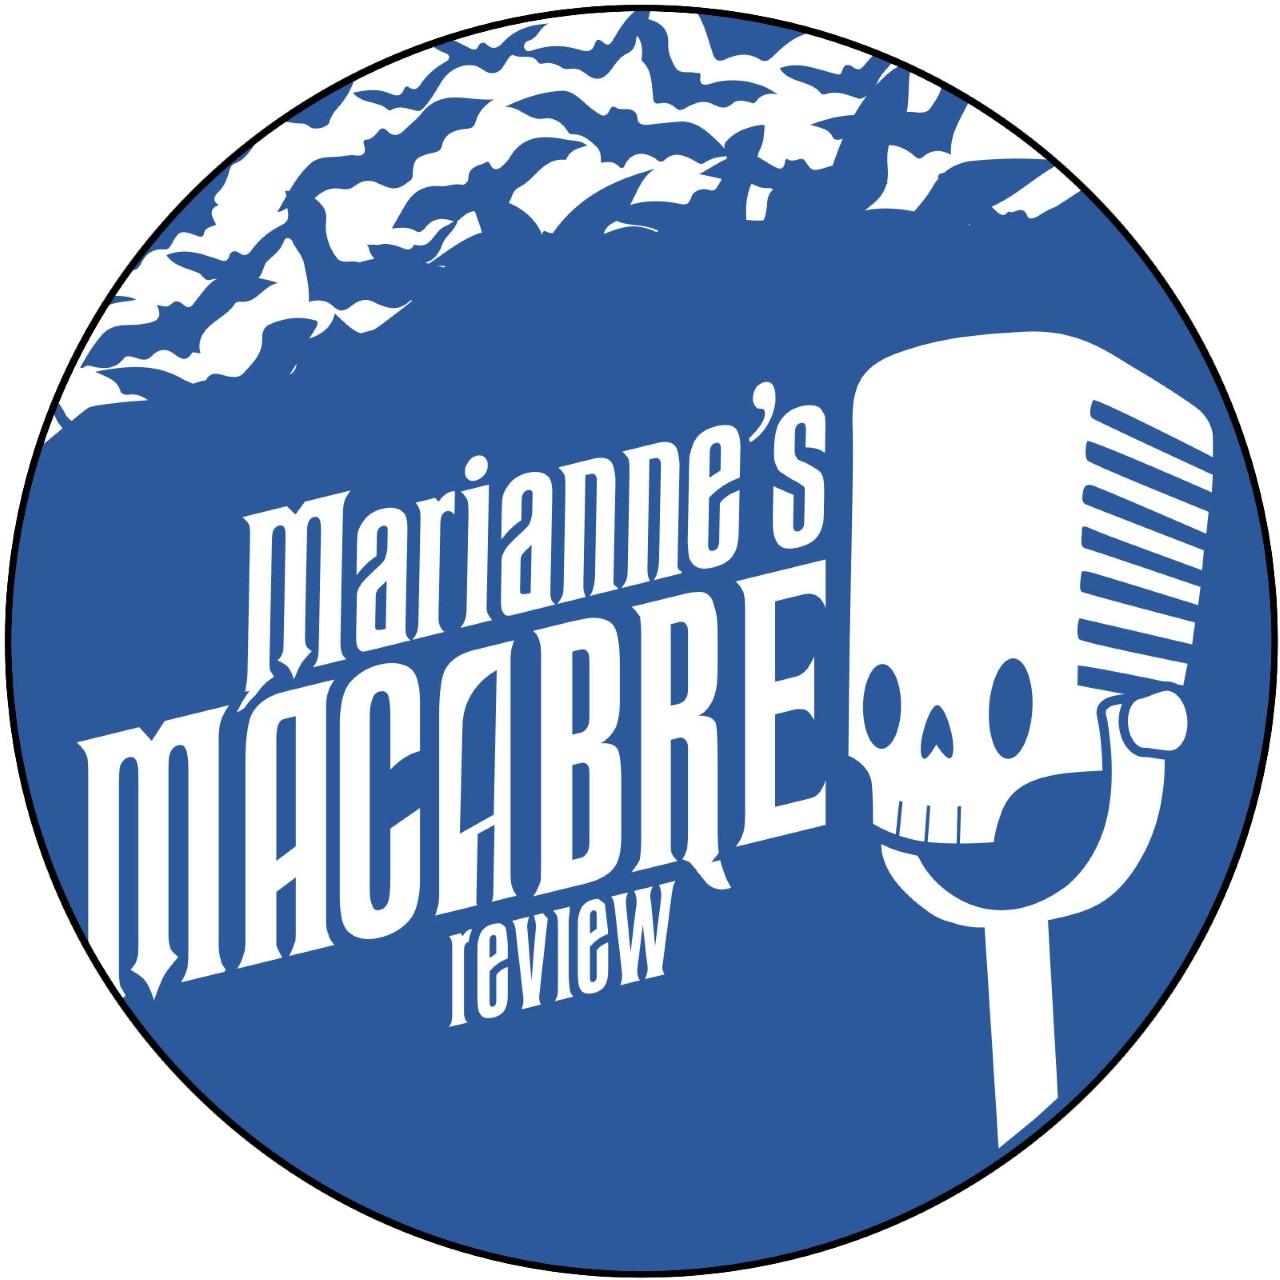 thumbnail_IABDP-IconLARGE-Marianne-newBlue.jpg